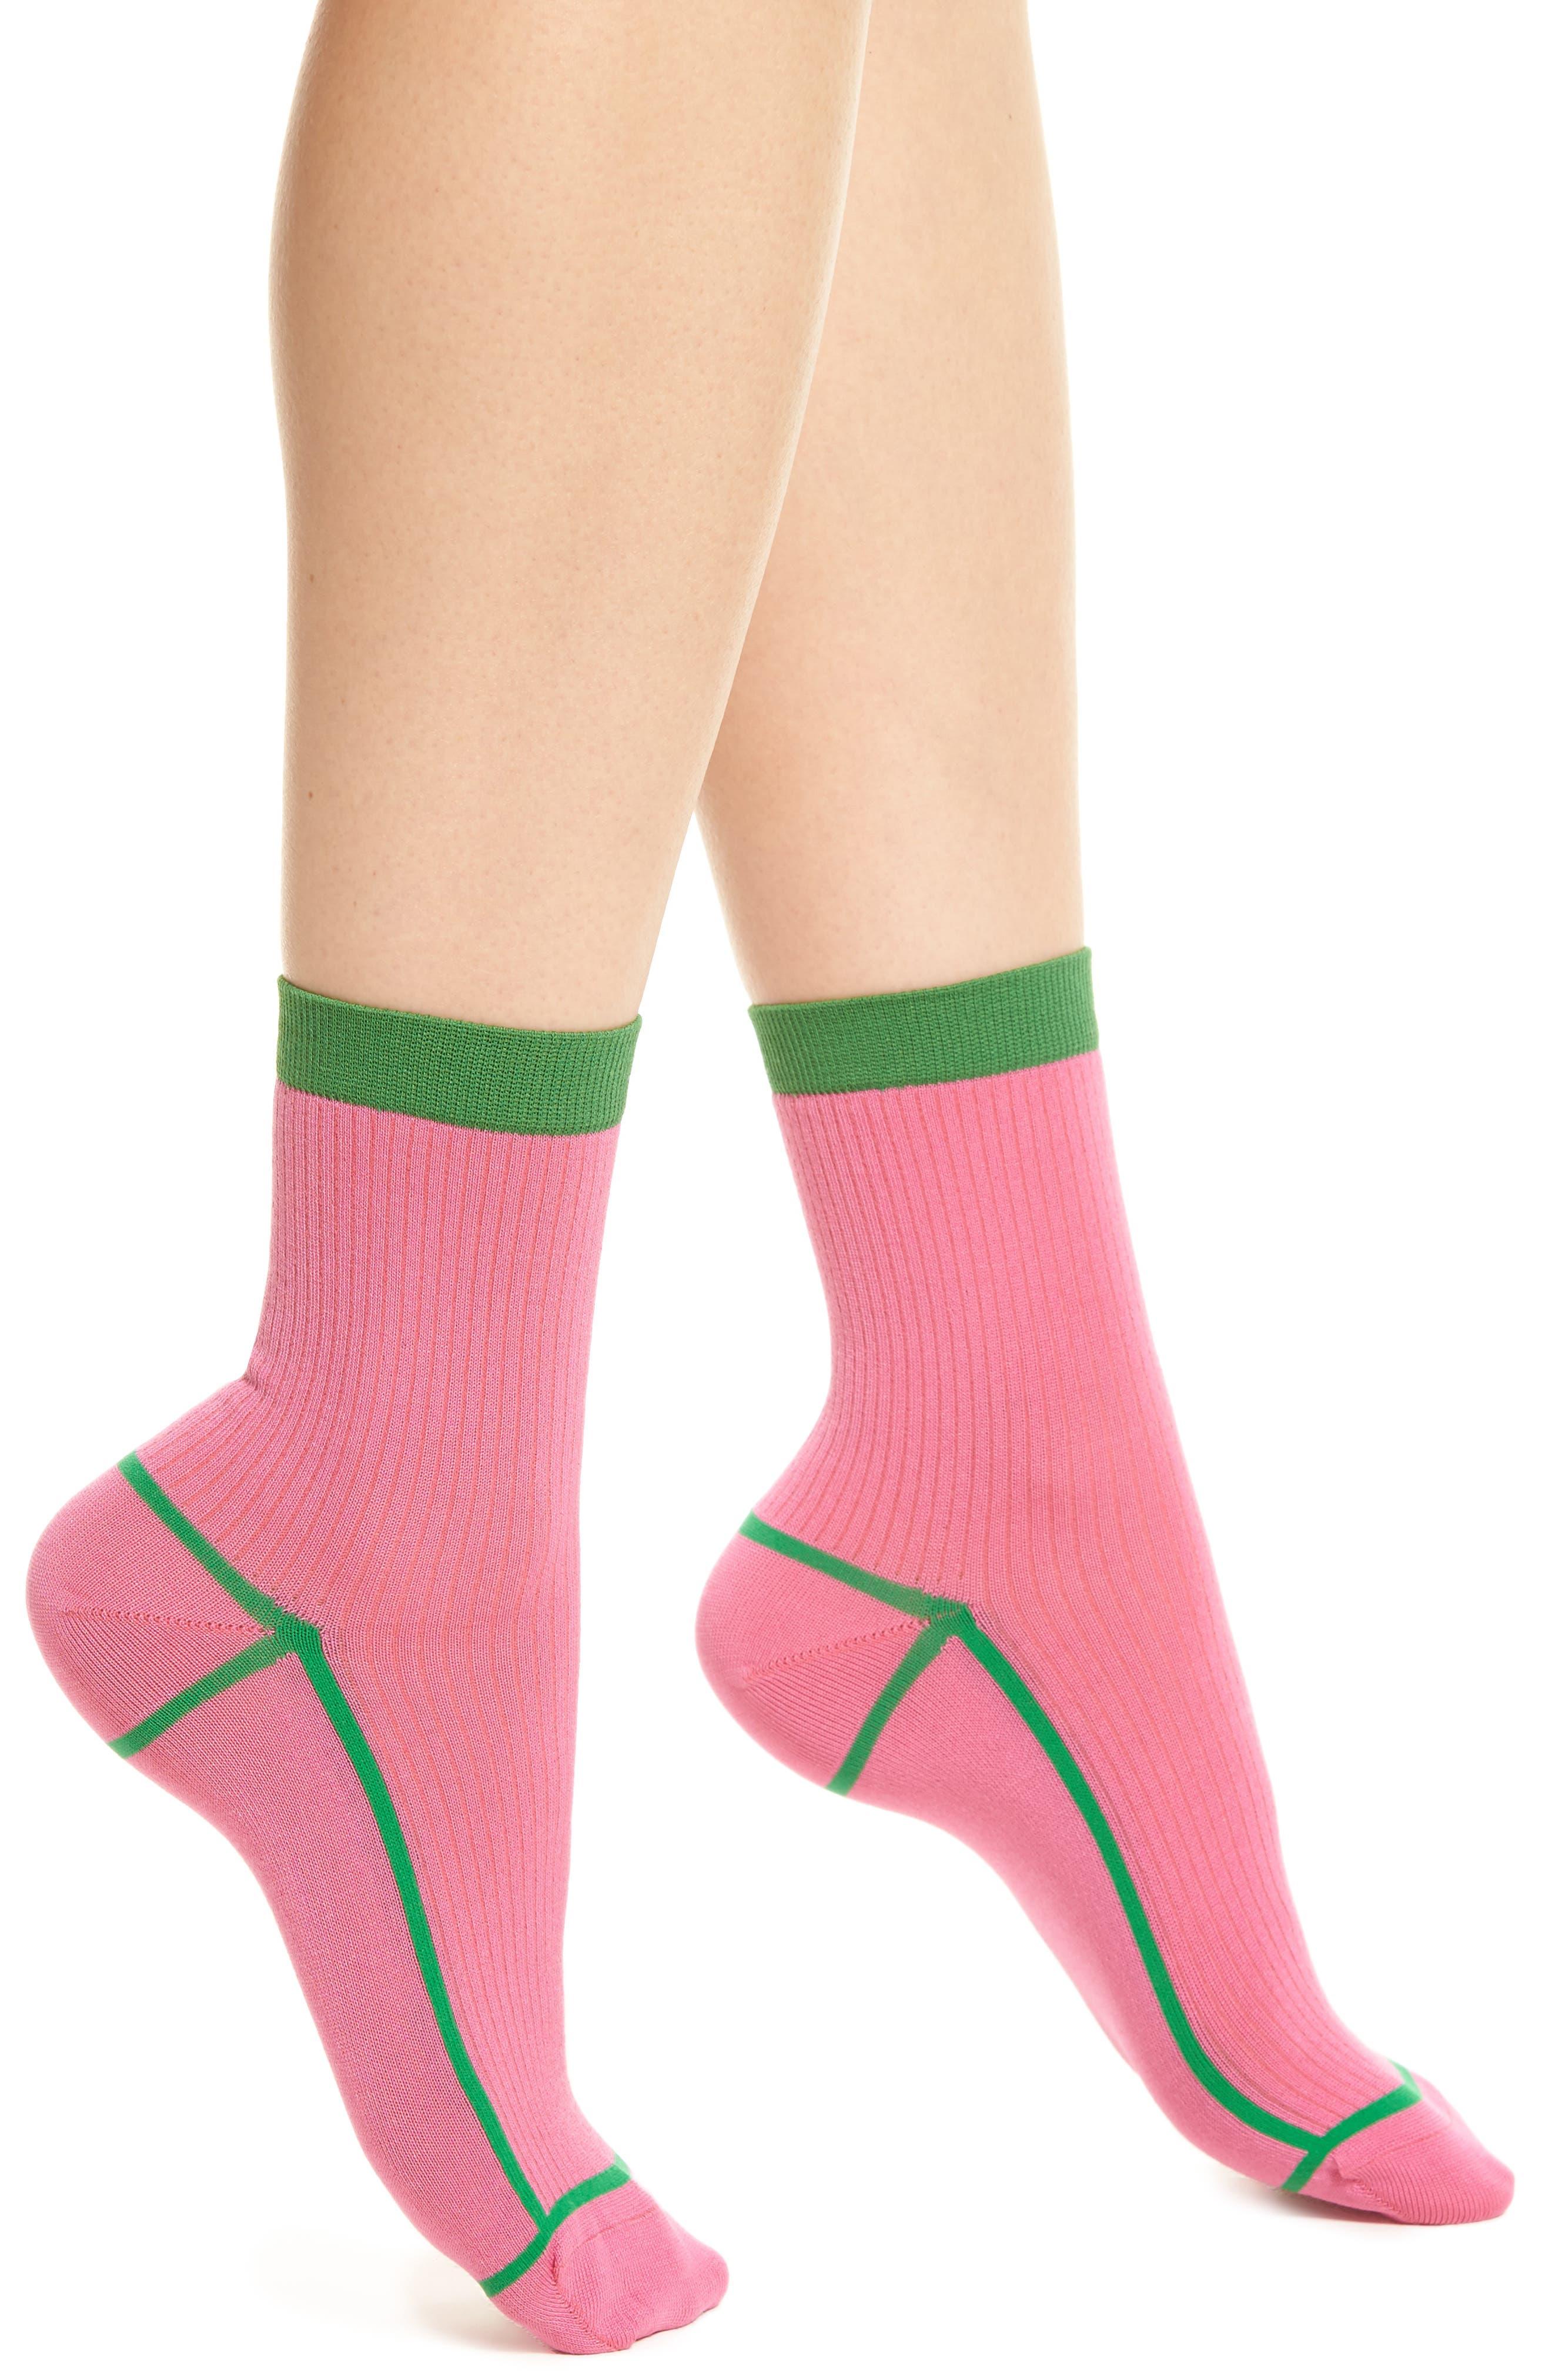 Hysteria by Happy Socks Lily Rib Ankle Socks